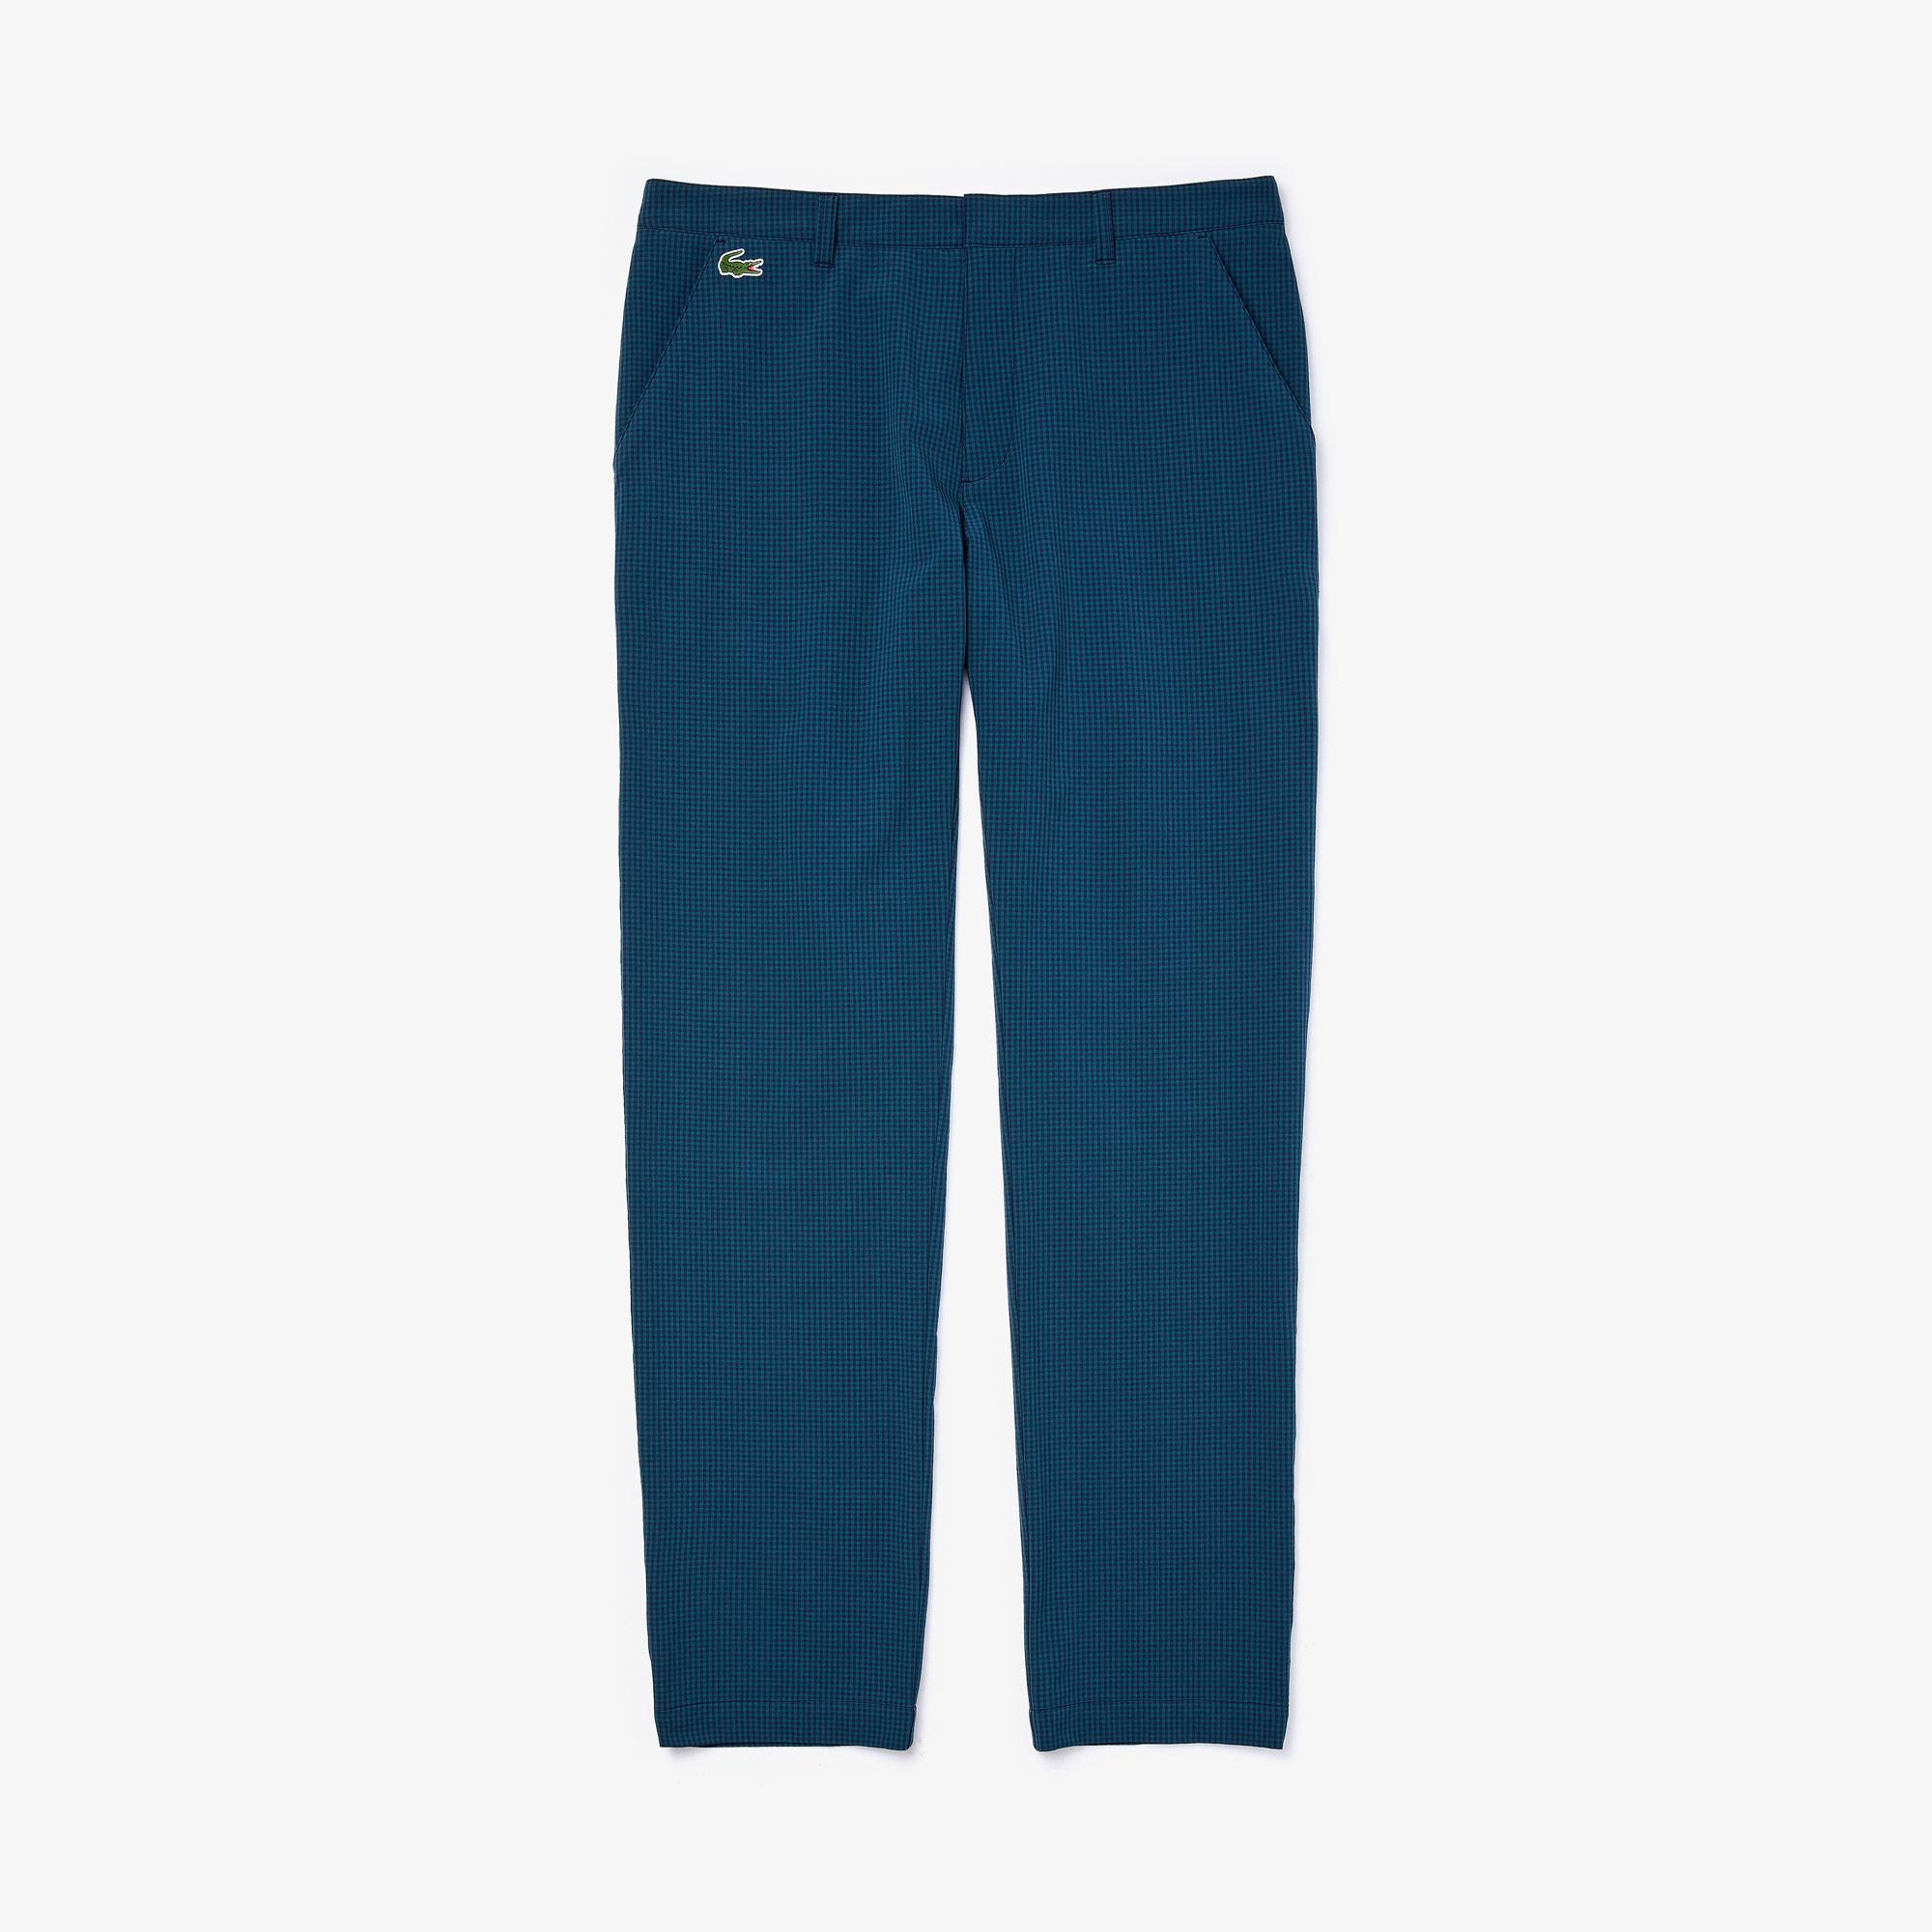 Lacoste Sport Erkek Desenli Lacivert Pantolon